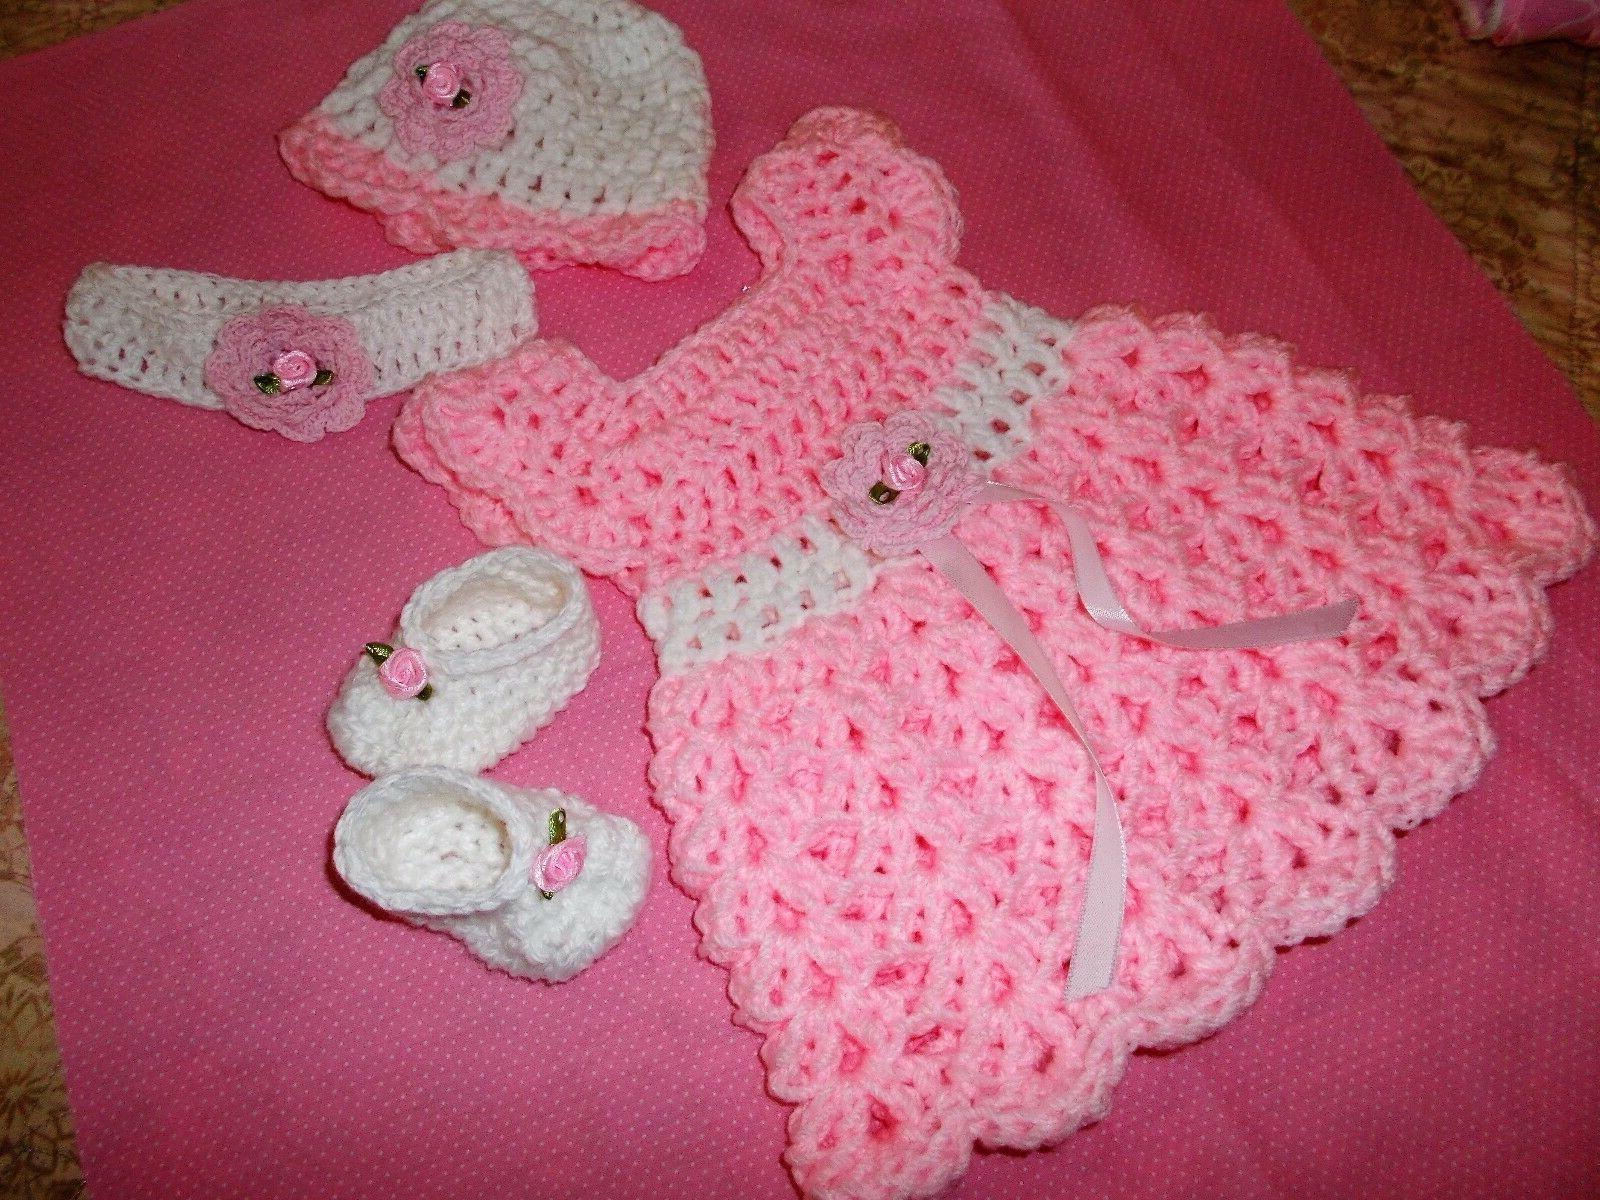 Handmade in USA Crochet baby girl shoes&